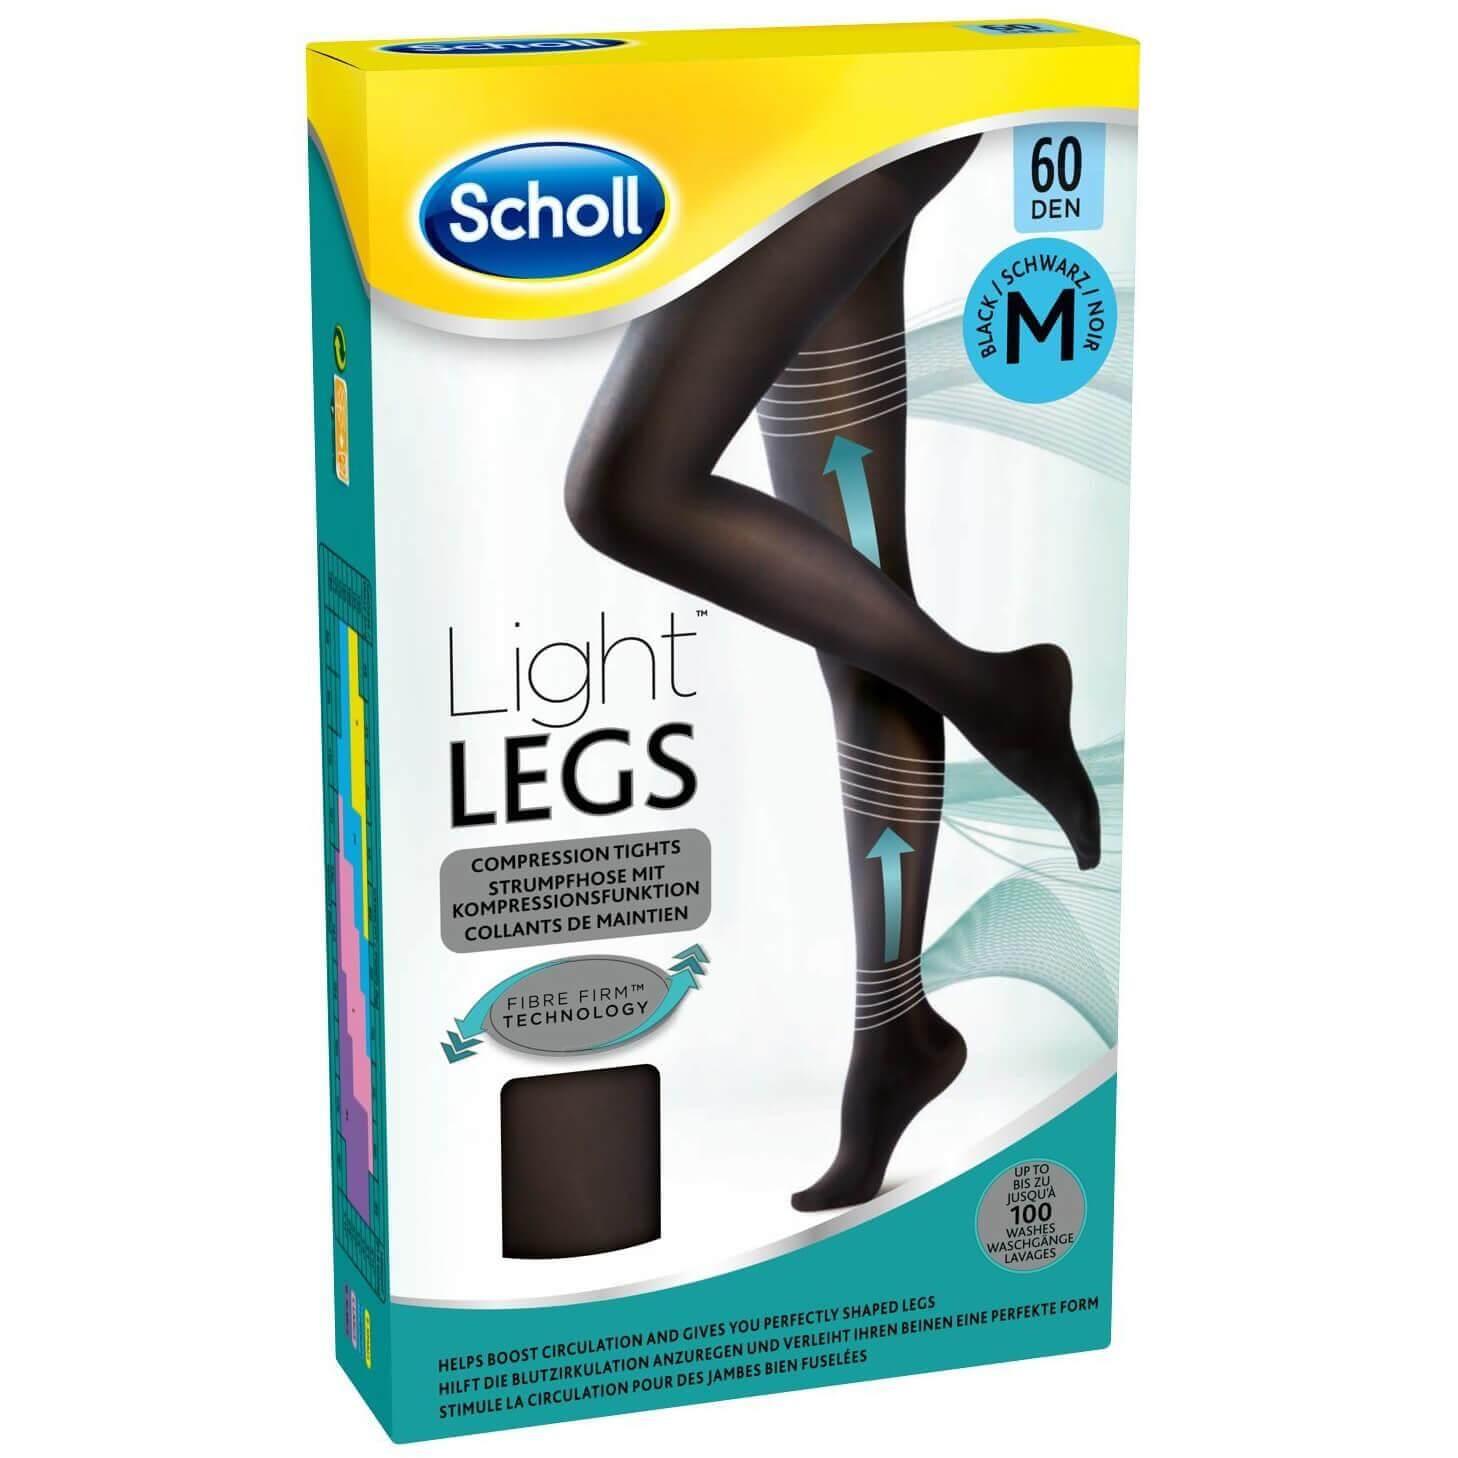 Dr Scholl Light Legs 60 DEN Noir Καλσόν Διαβαθμισμένης Συμπίεσης με Τεχνολογία Fibre Firm σε Μαύρο Χρώμα – M